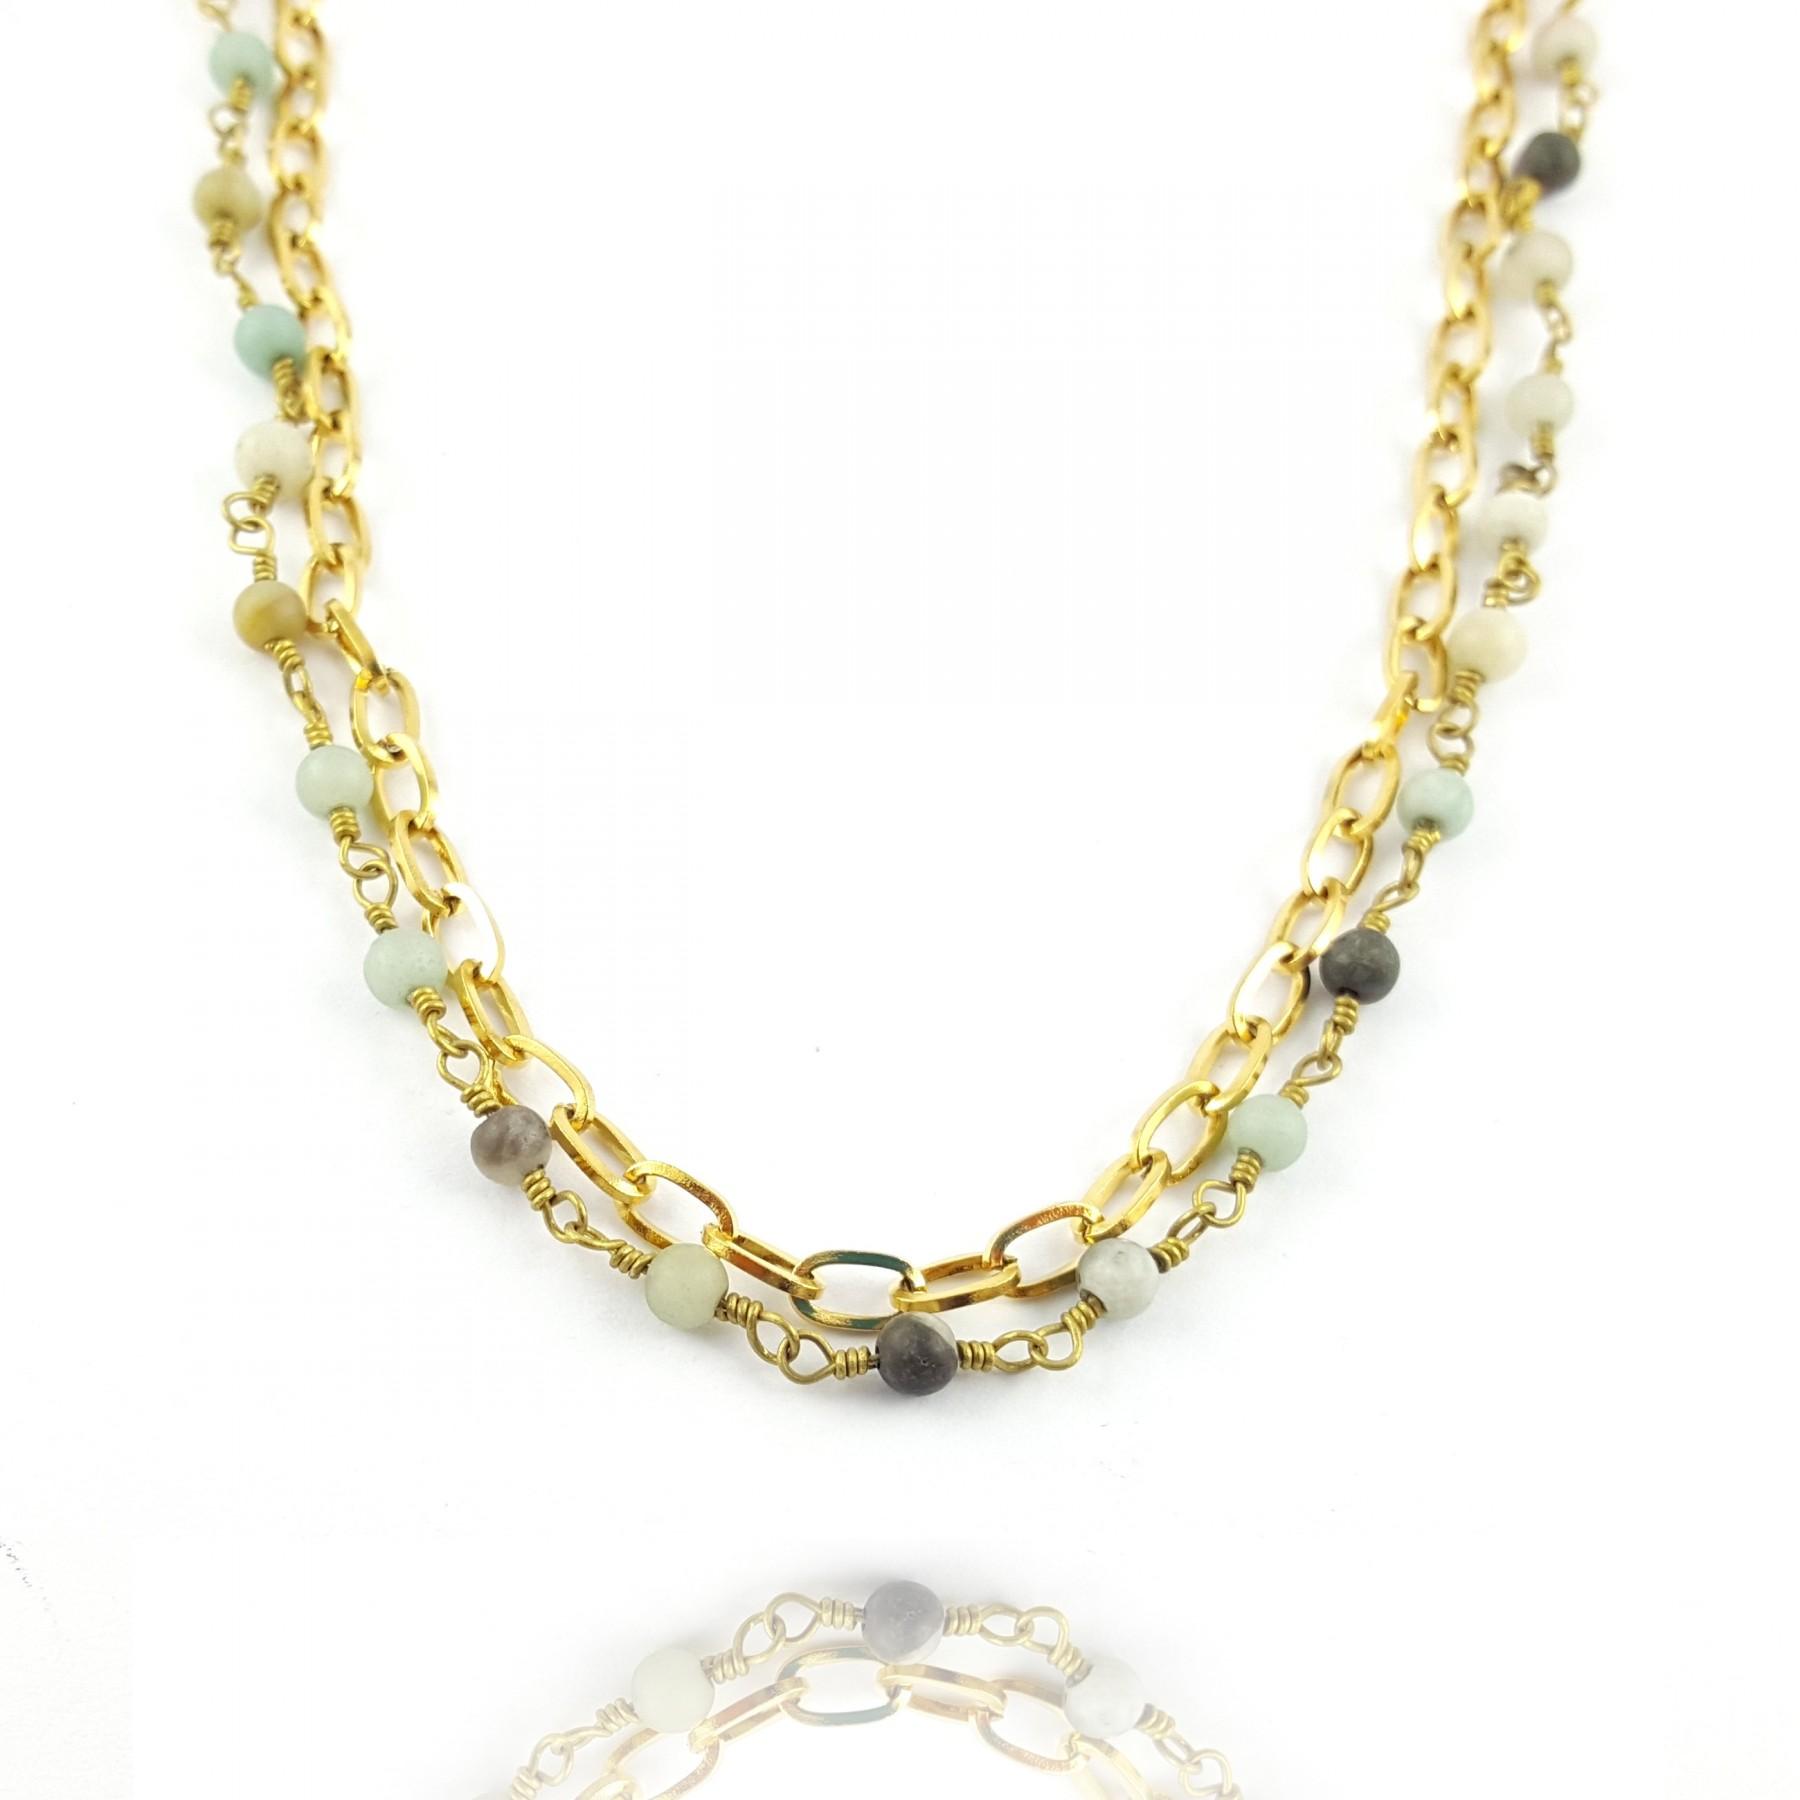 Collier double chaîne amazonite